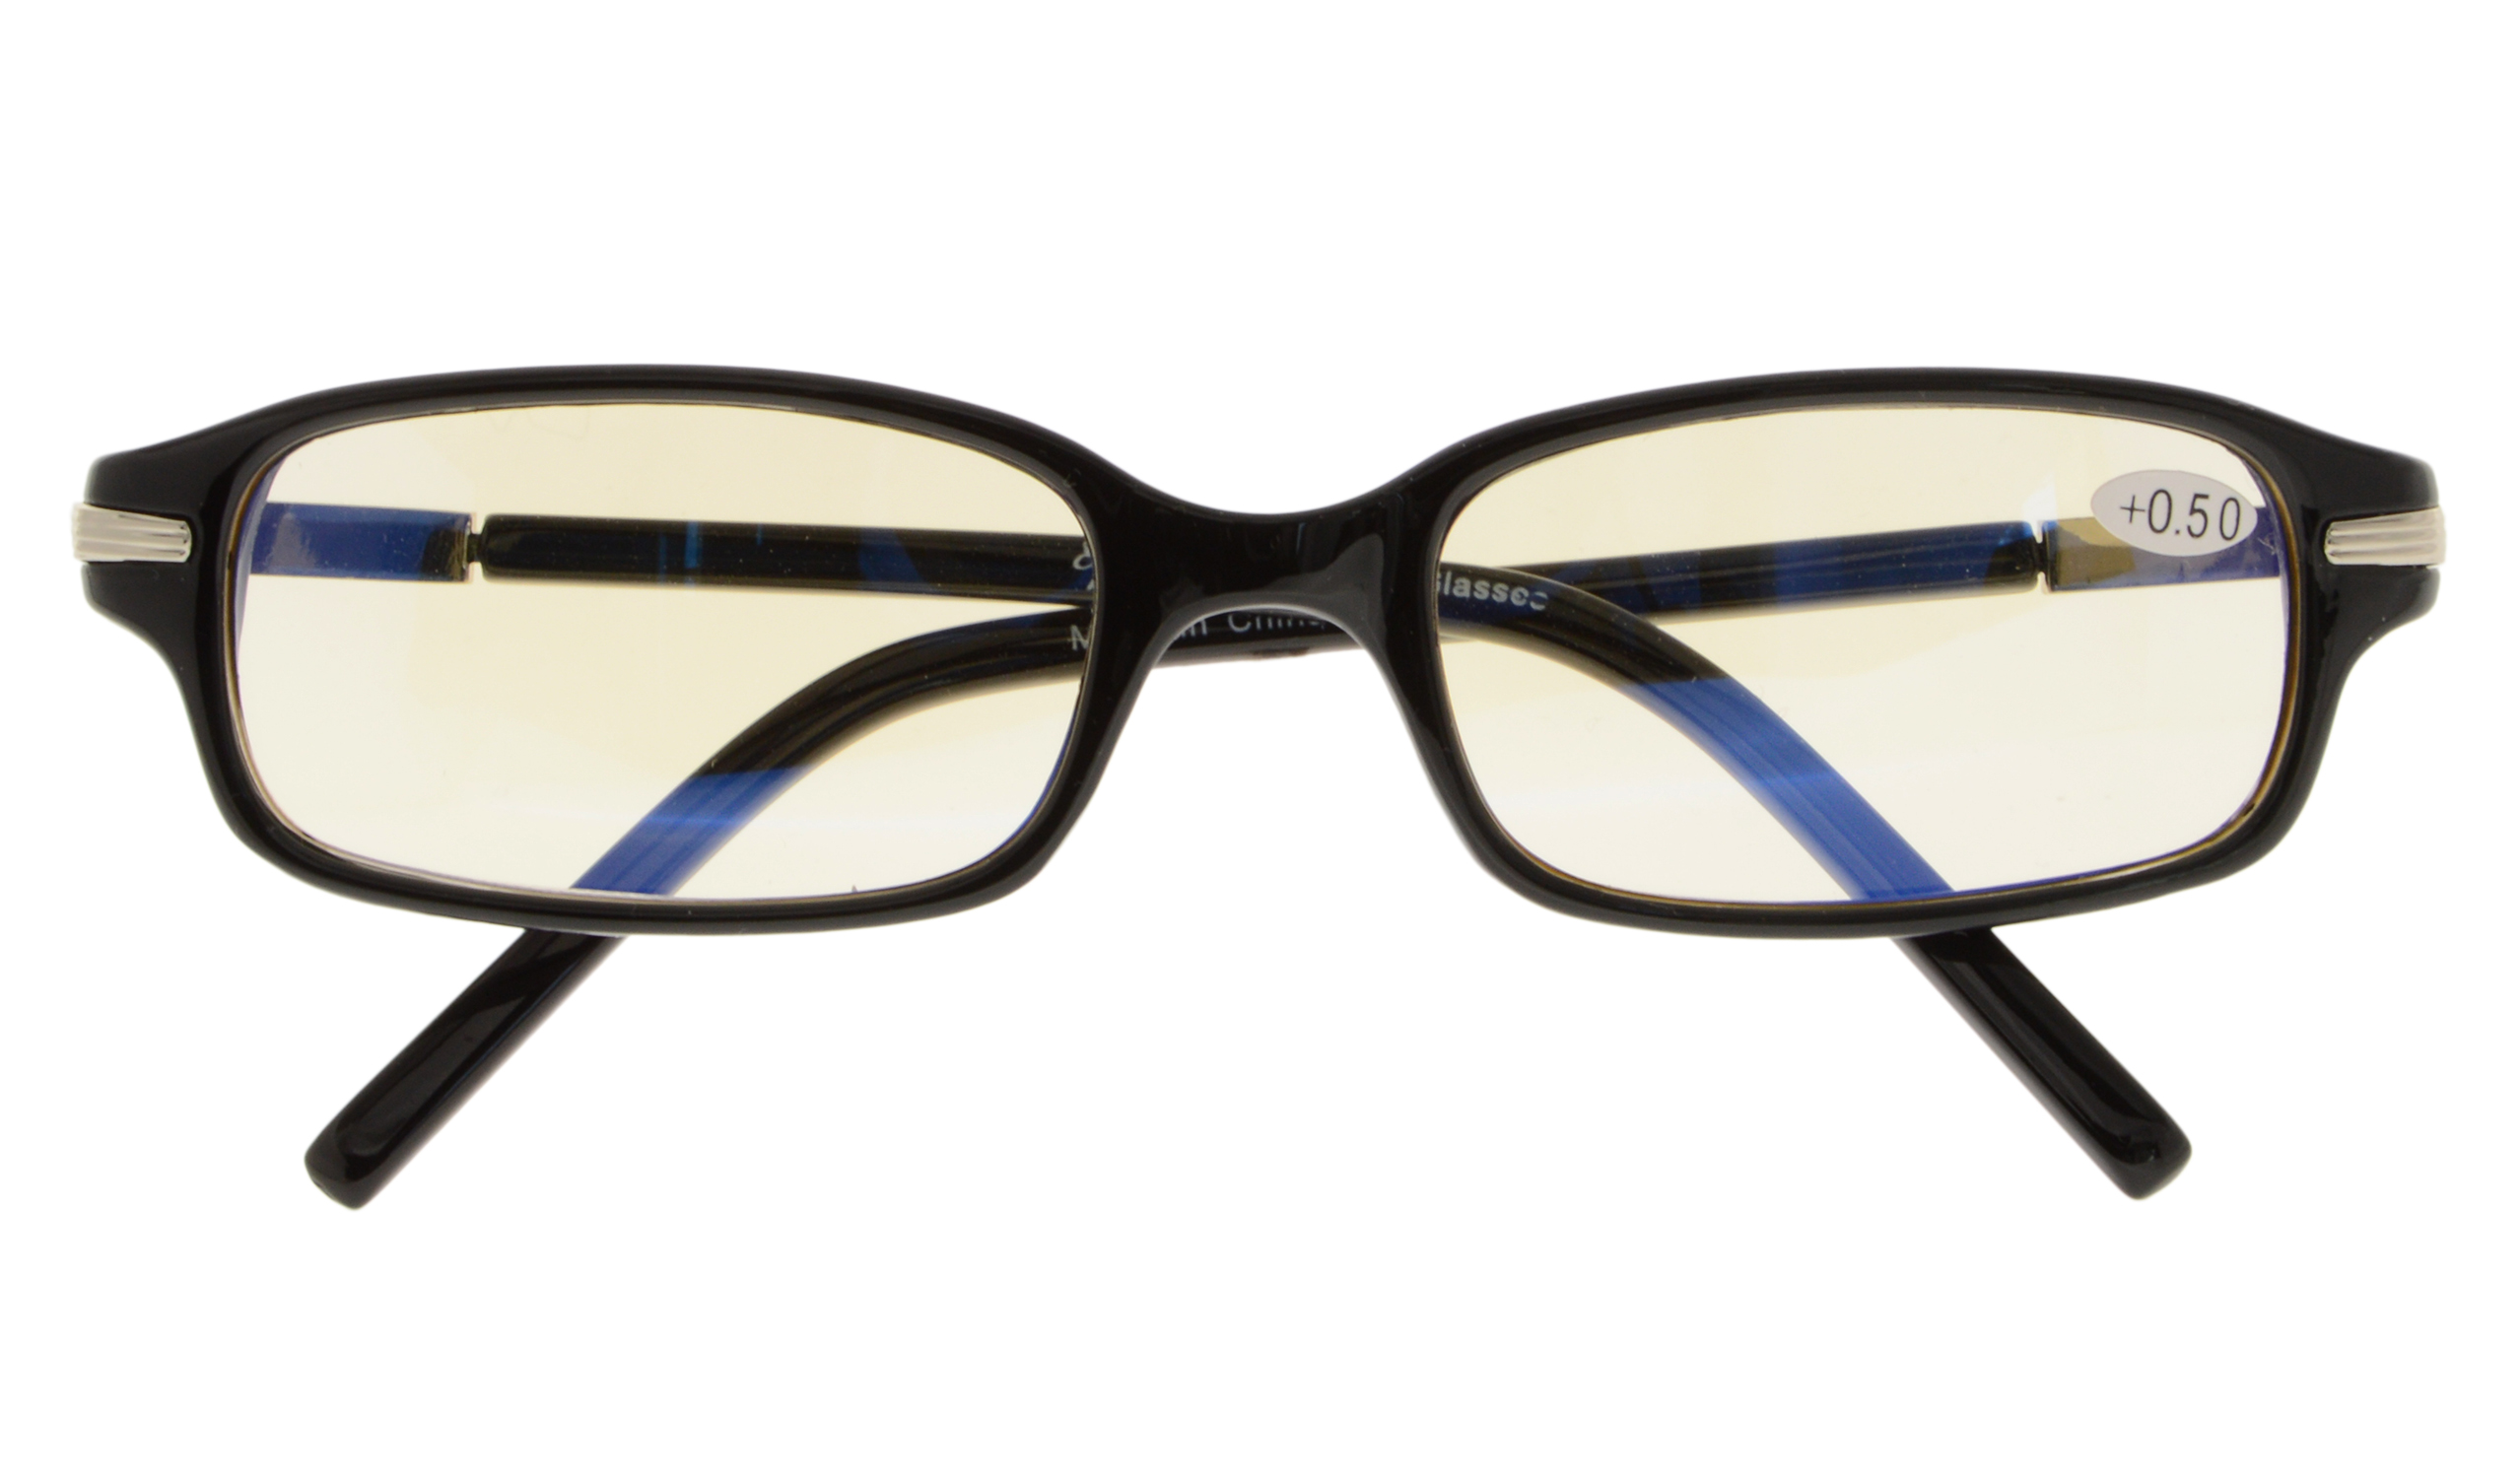 b15c39e714c6 Eyekepper Computer Reading Glasses UV Protection Tinted Lens Spring Hinge  Men CG035